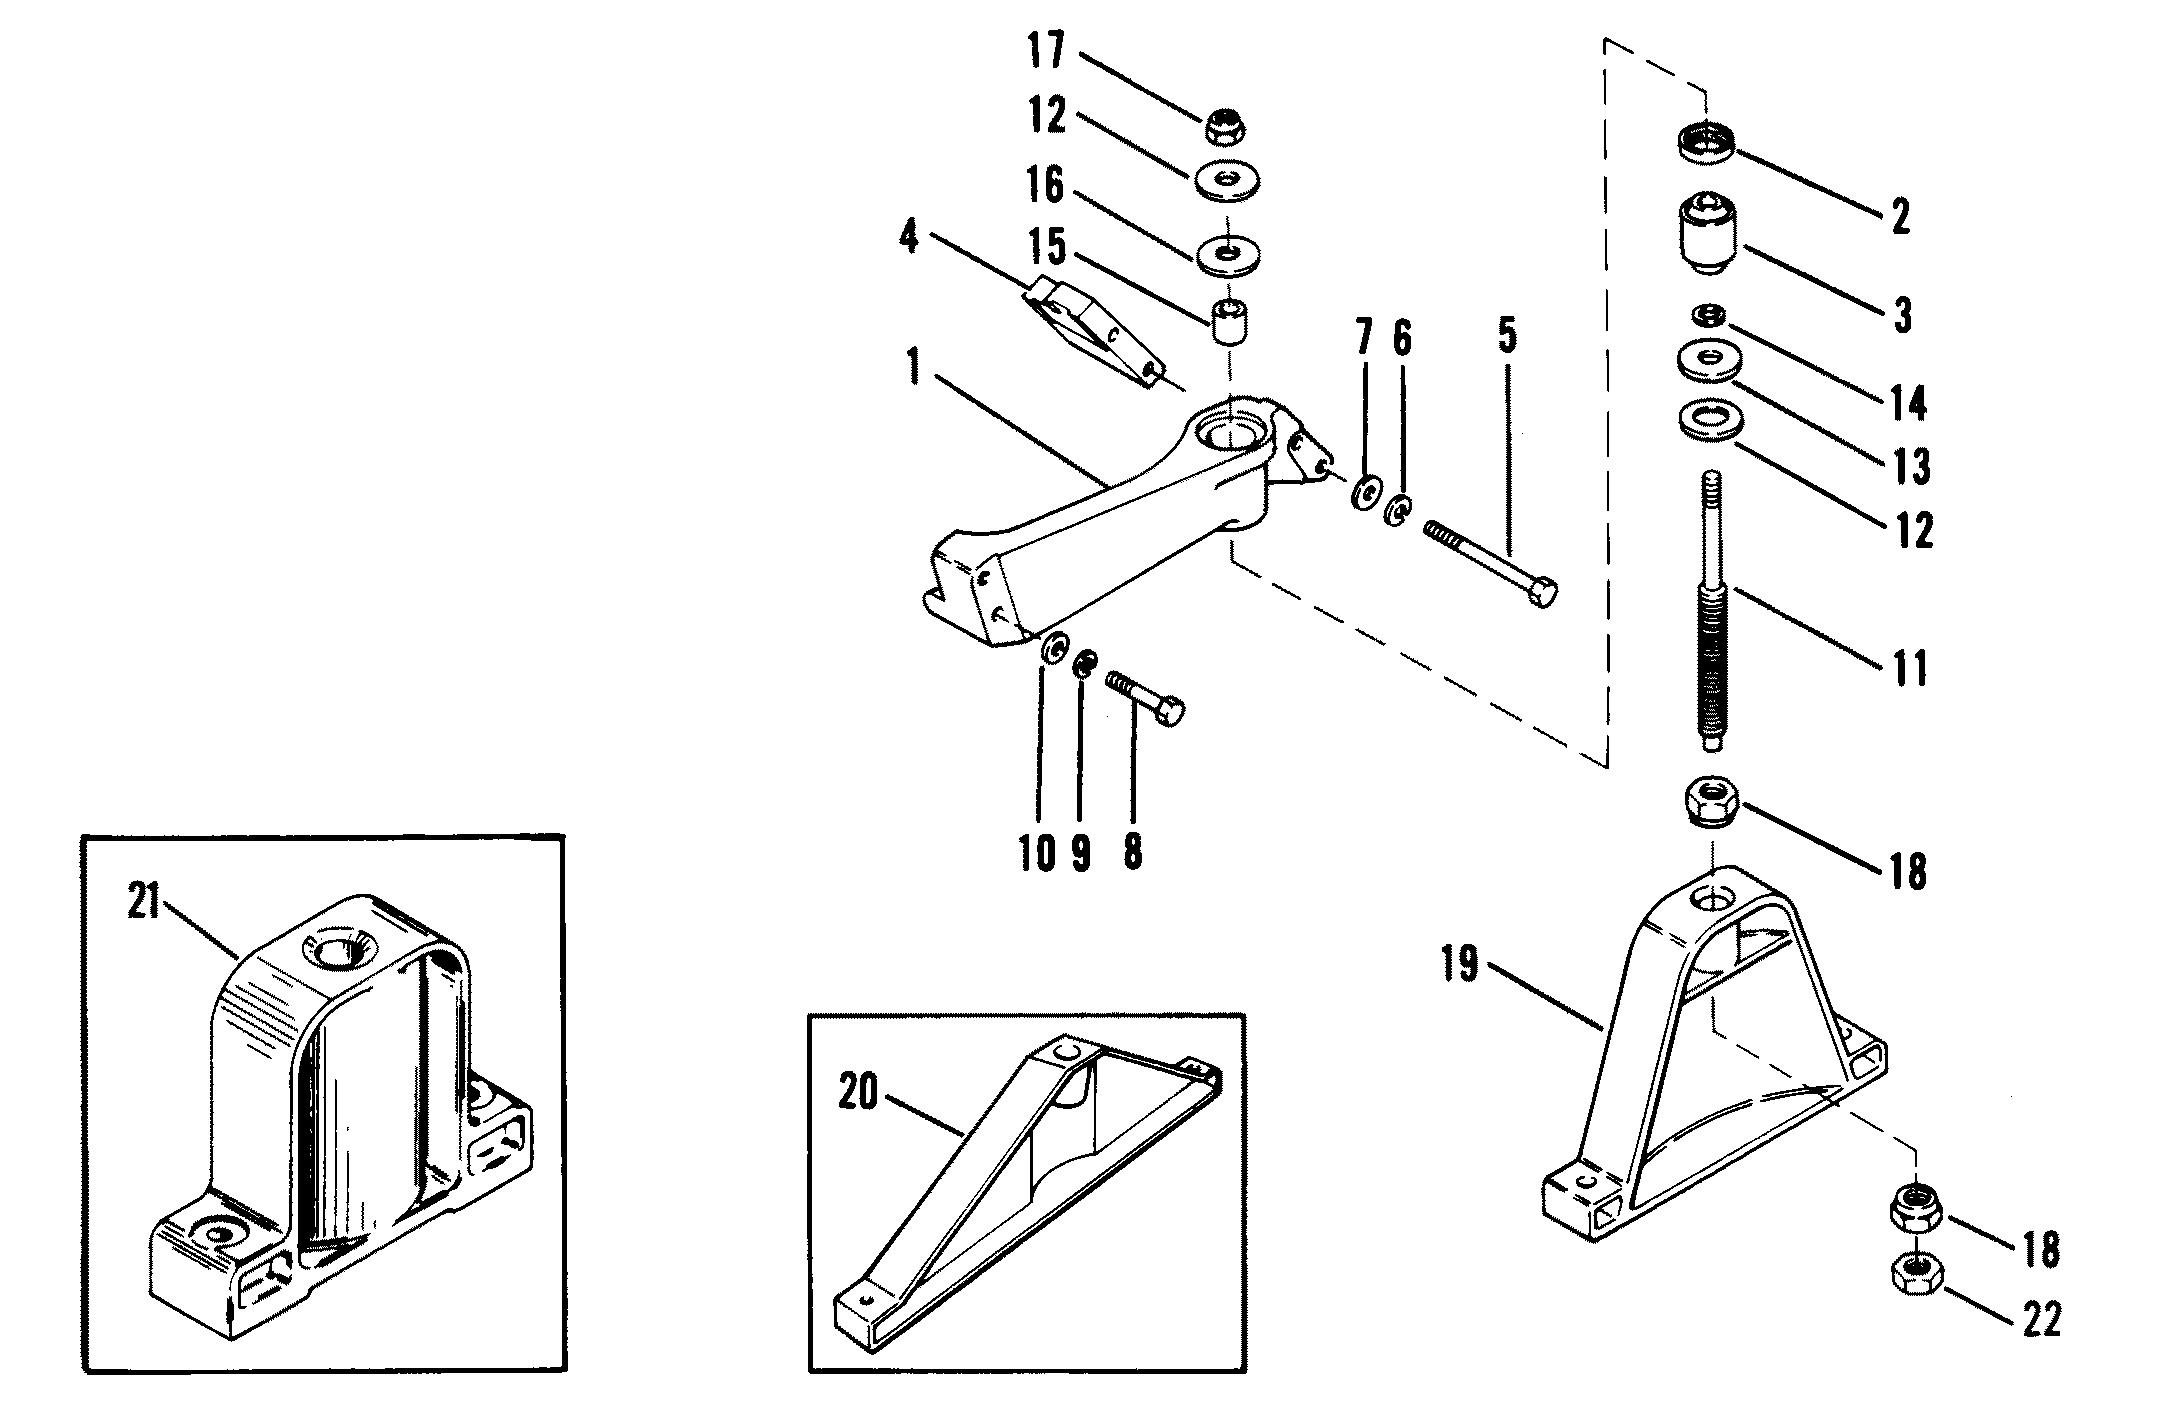 3 0 mercruiser engine mount diagram product wiring diagrams u2022 rh genesisventures us